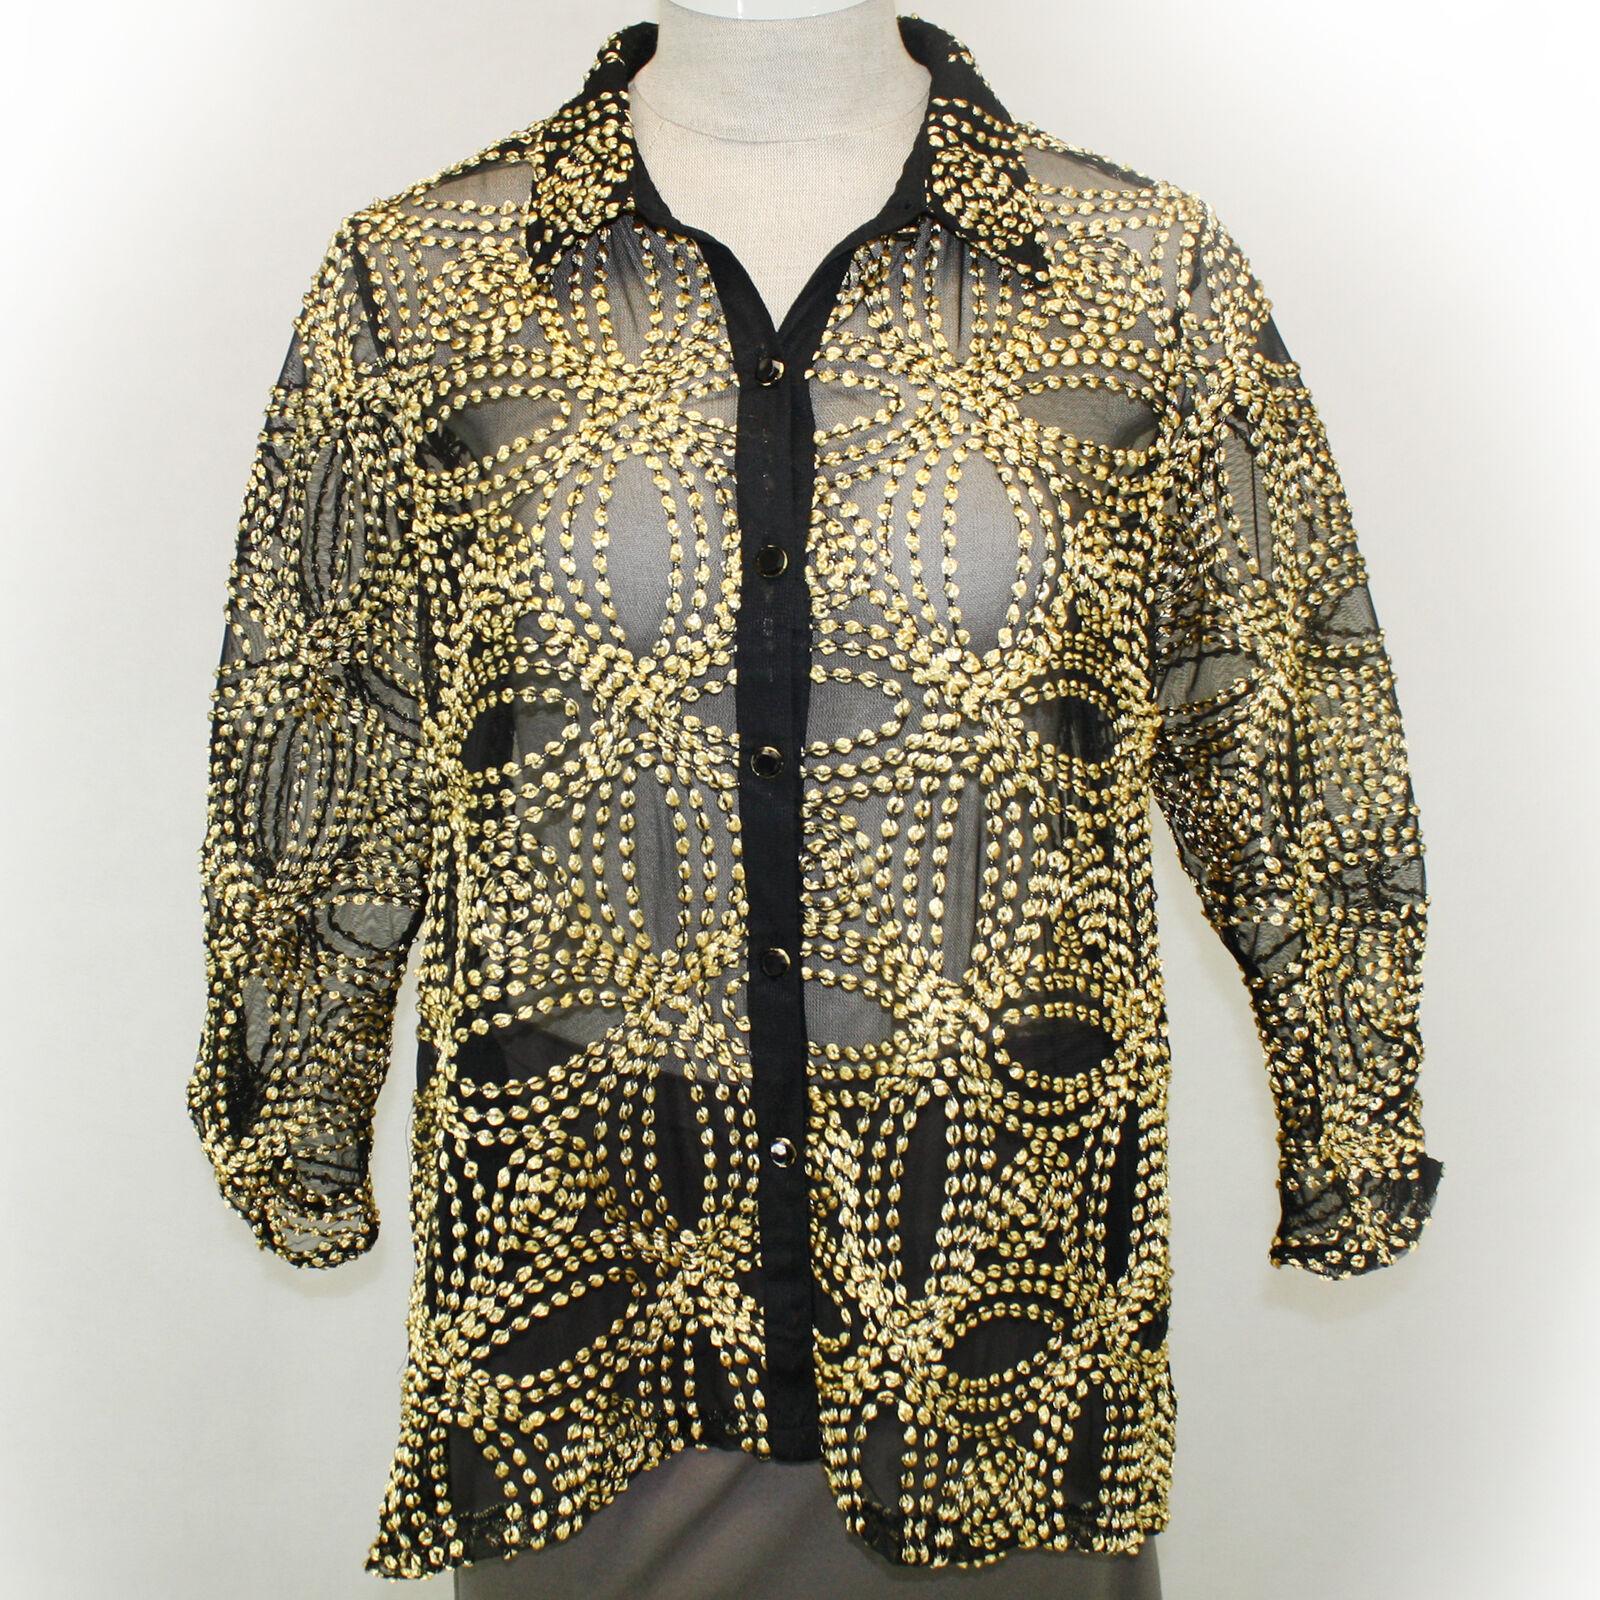 NEW NWT Berek Plus Größe Embroiderot Seeds of Gold Mesh Jacket Blouse Top 2X, 2XL